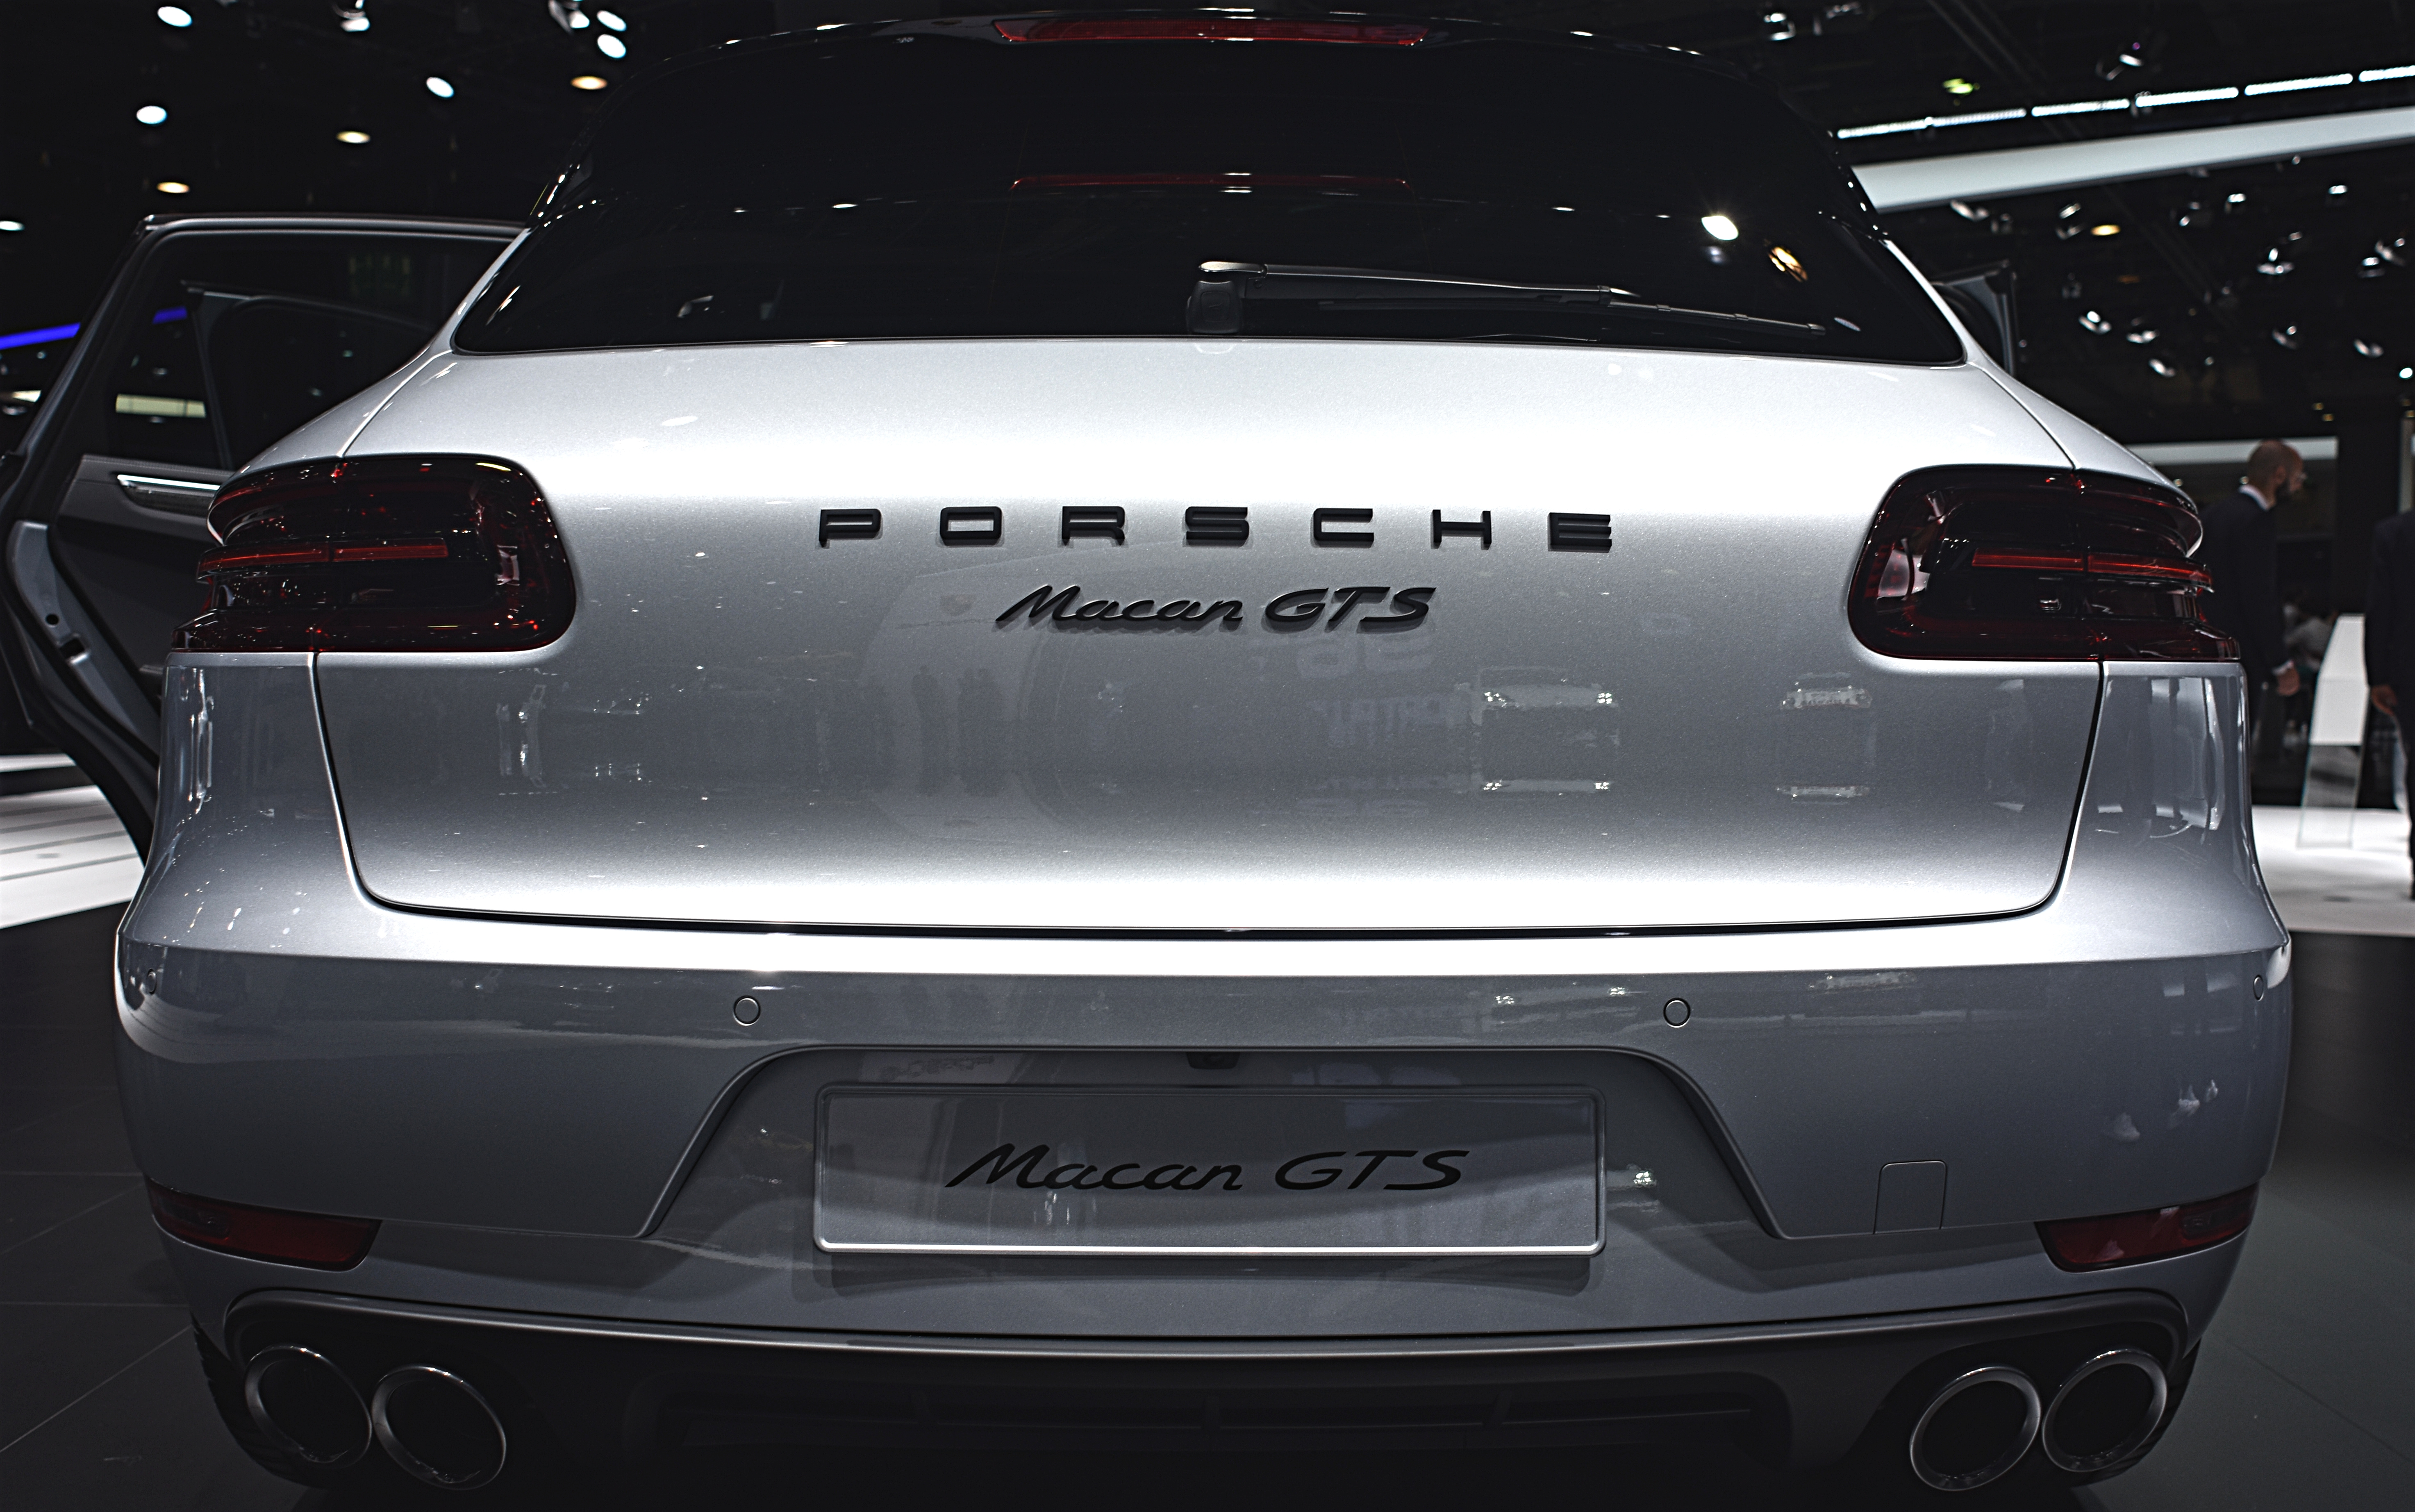 File Porsche Macan Gts Rear Iaa 2017 By Nicolas Volcker Jpg Wikimedia Commons